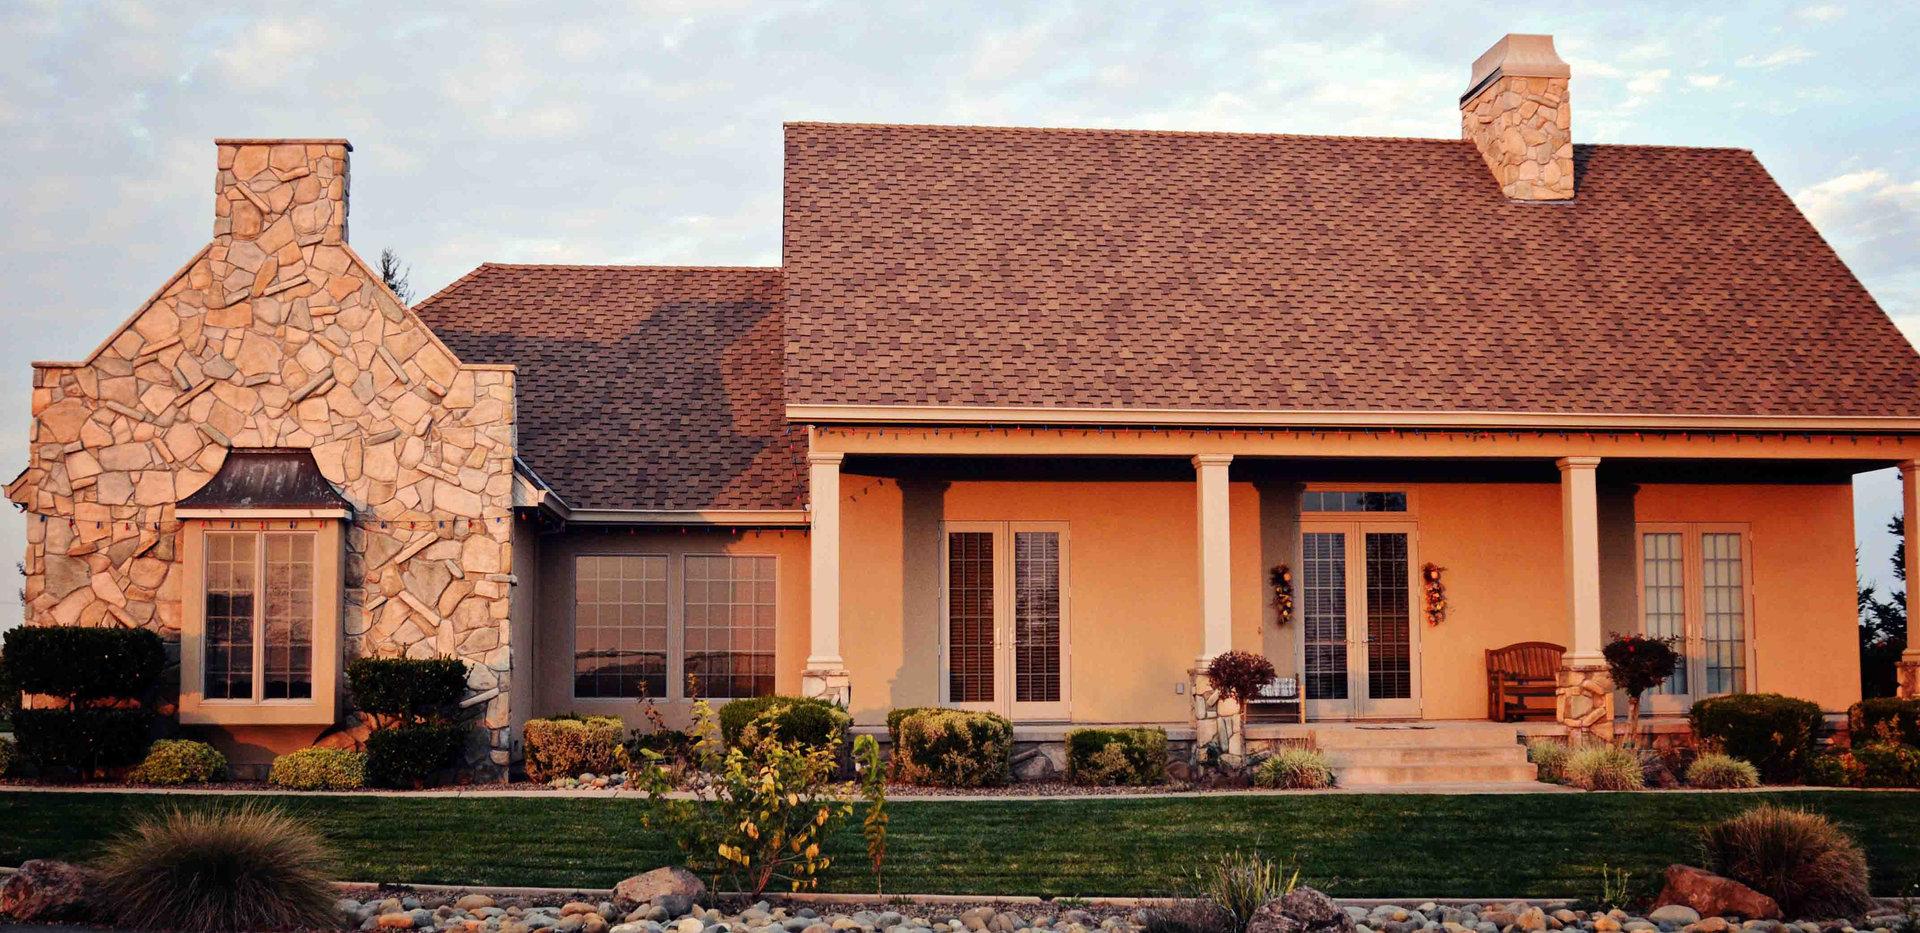 SVE house 4594.jpg